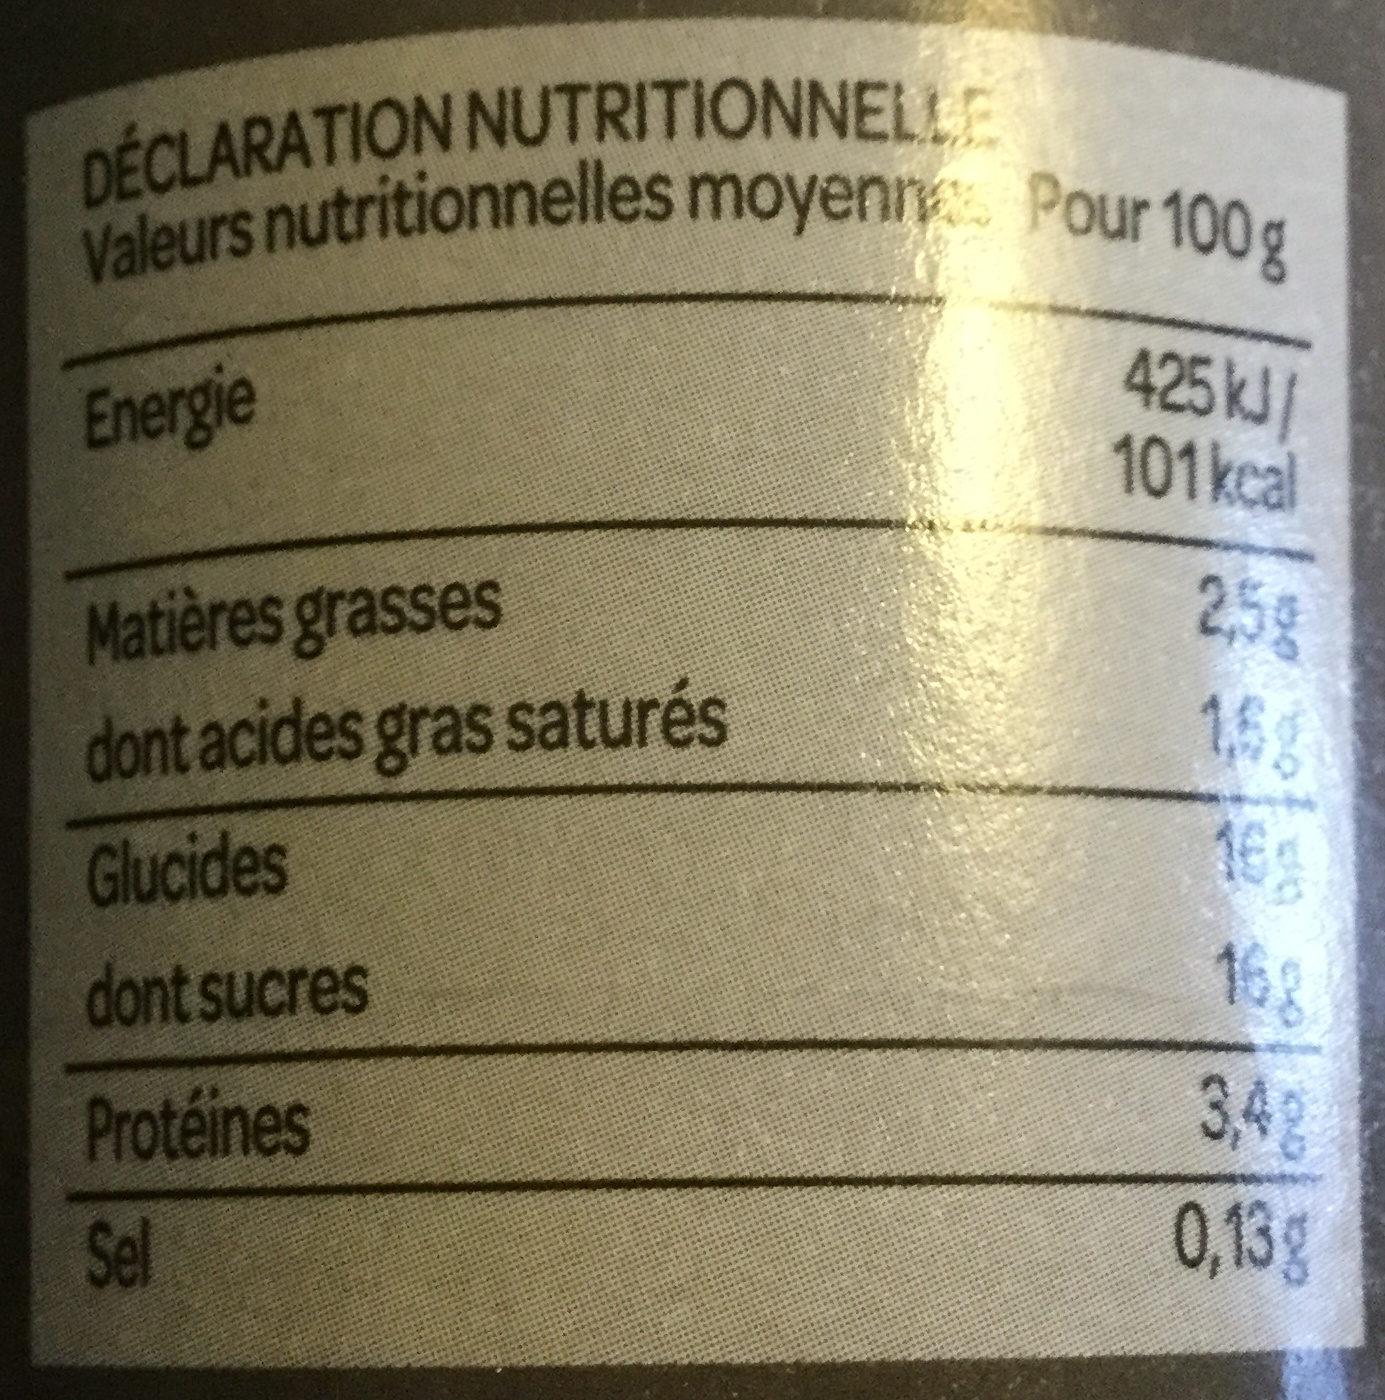 Grand Dessert - Yaourt cerise - Información nutricional - fr